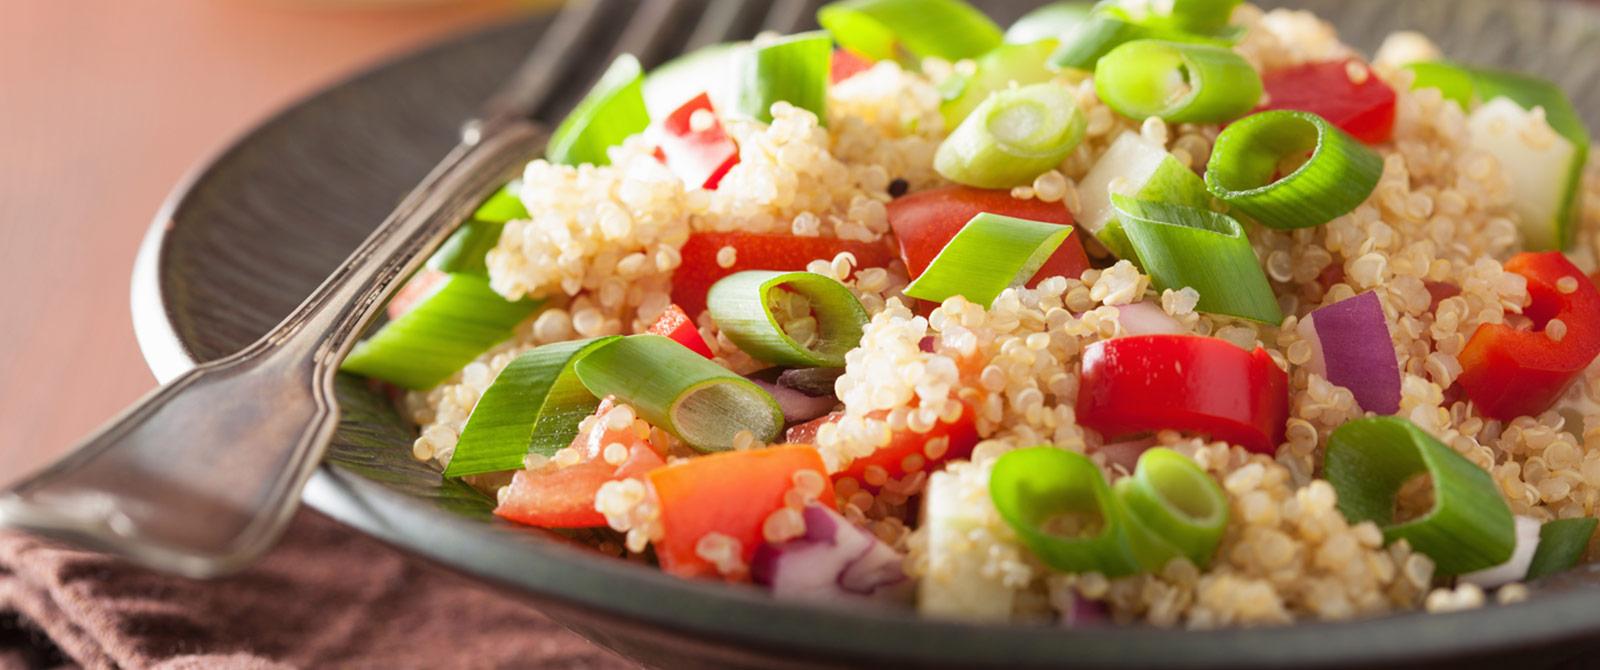 Marketplace Foods Natural Foods